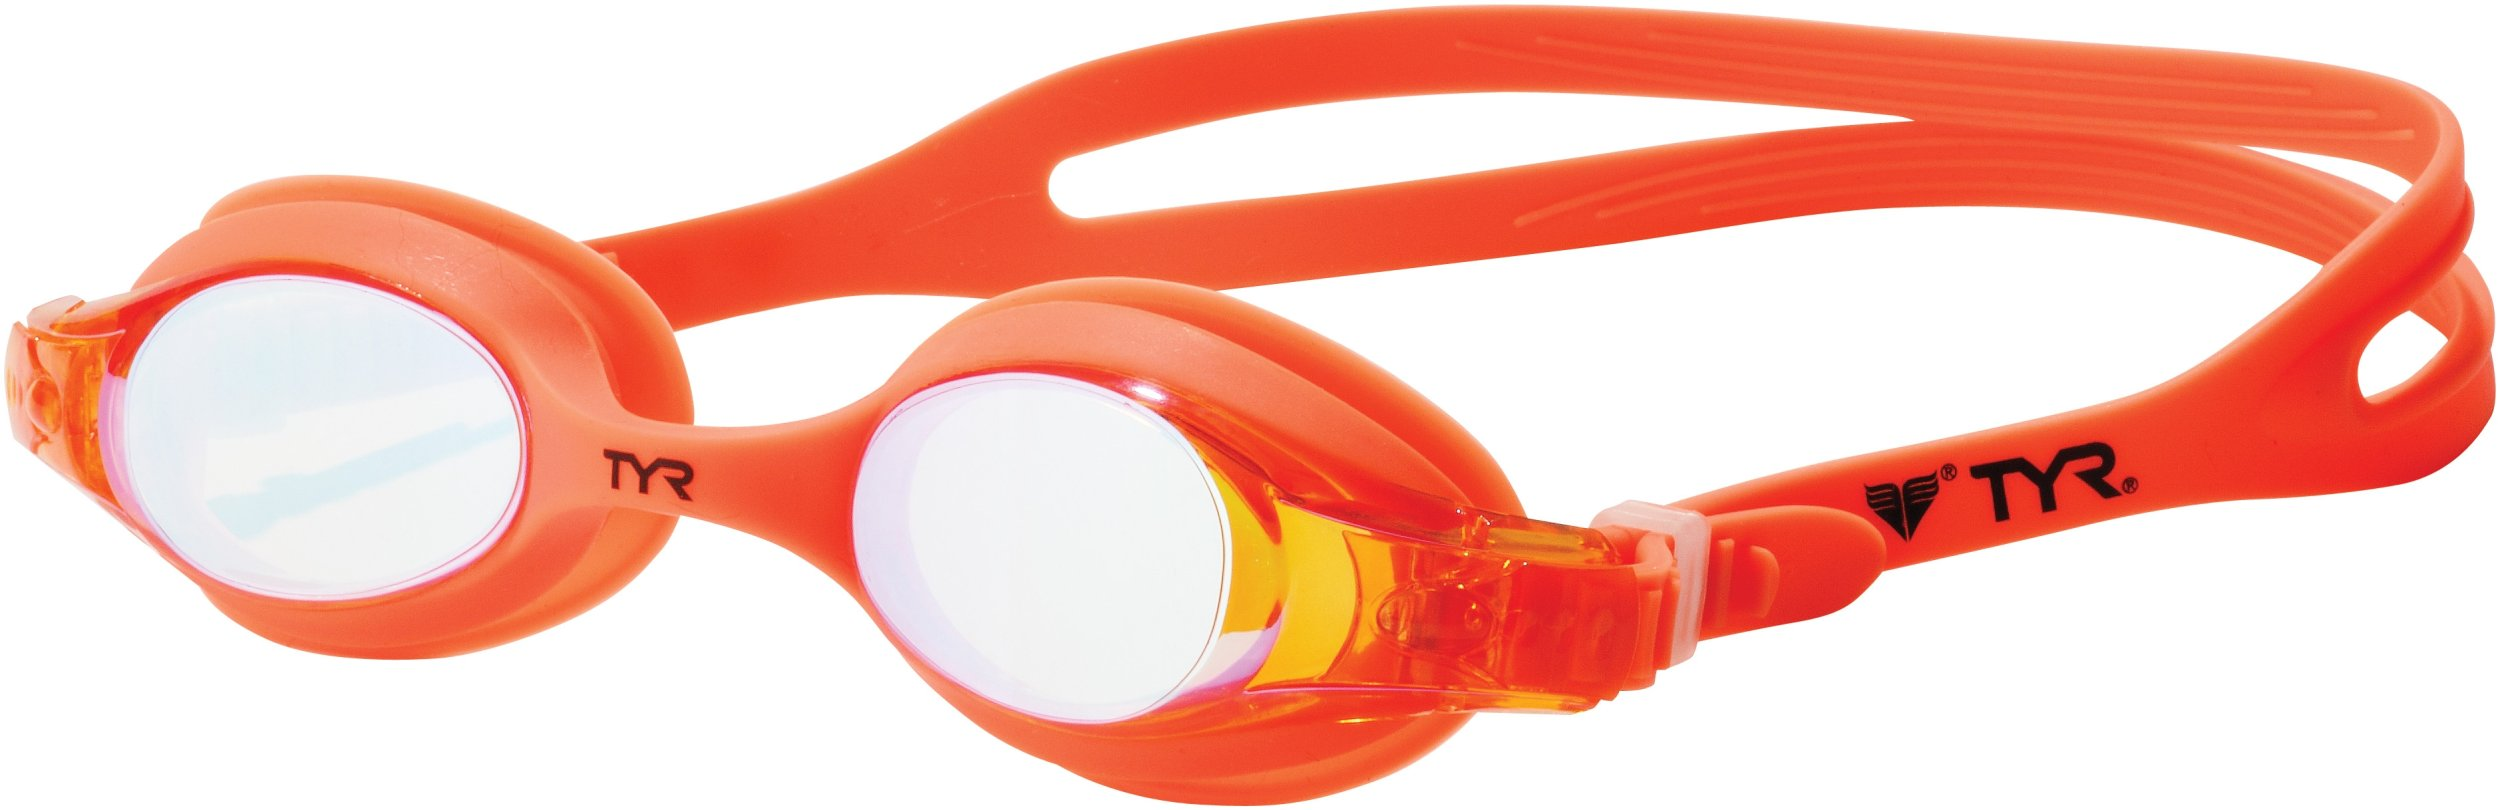 TYR Swimple Youth Metallized Goggle (Manic Mango)